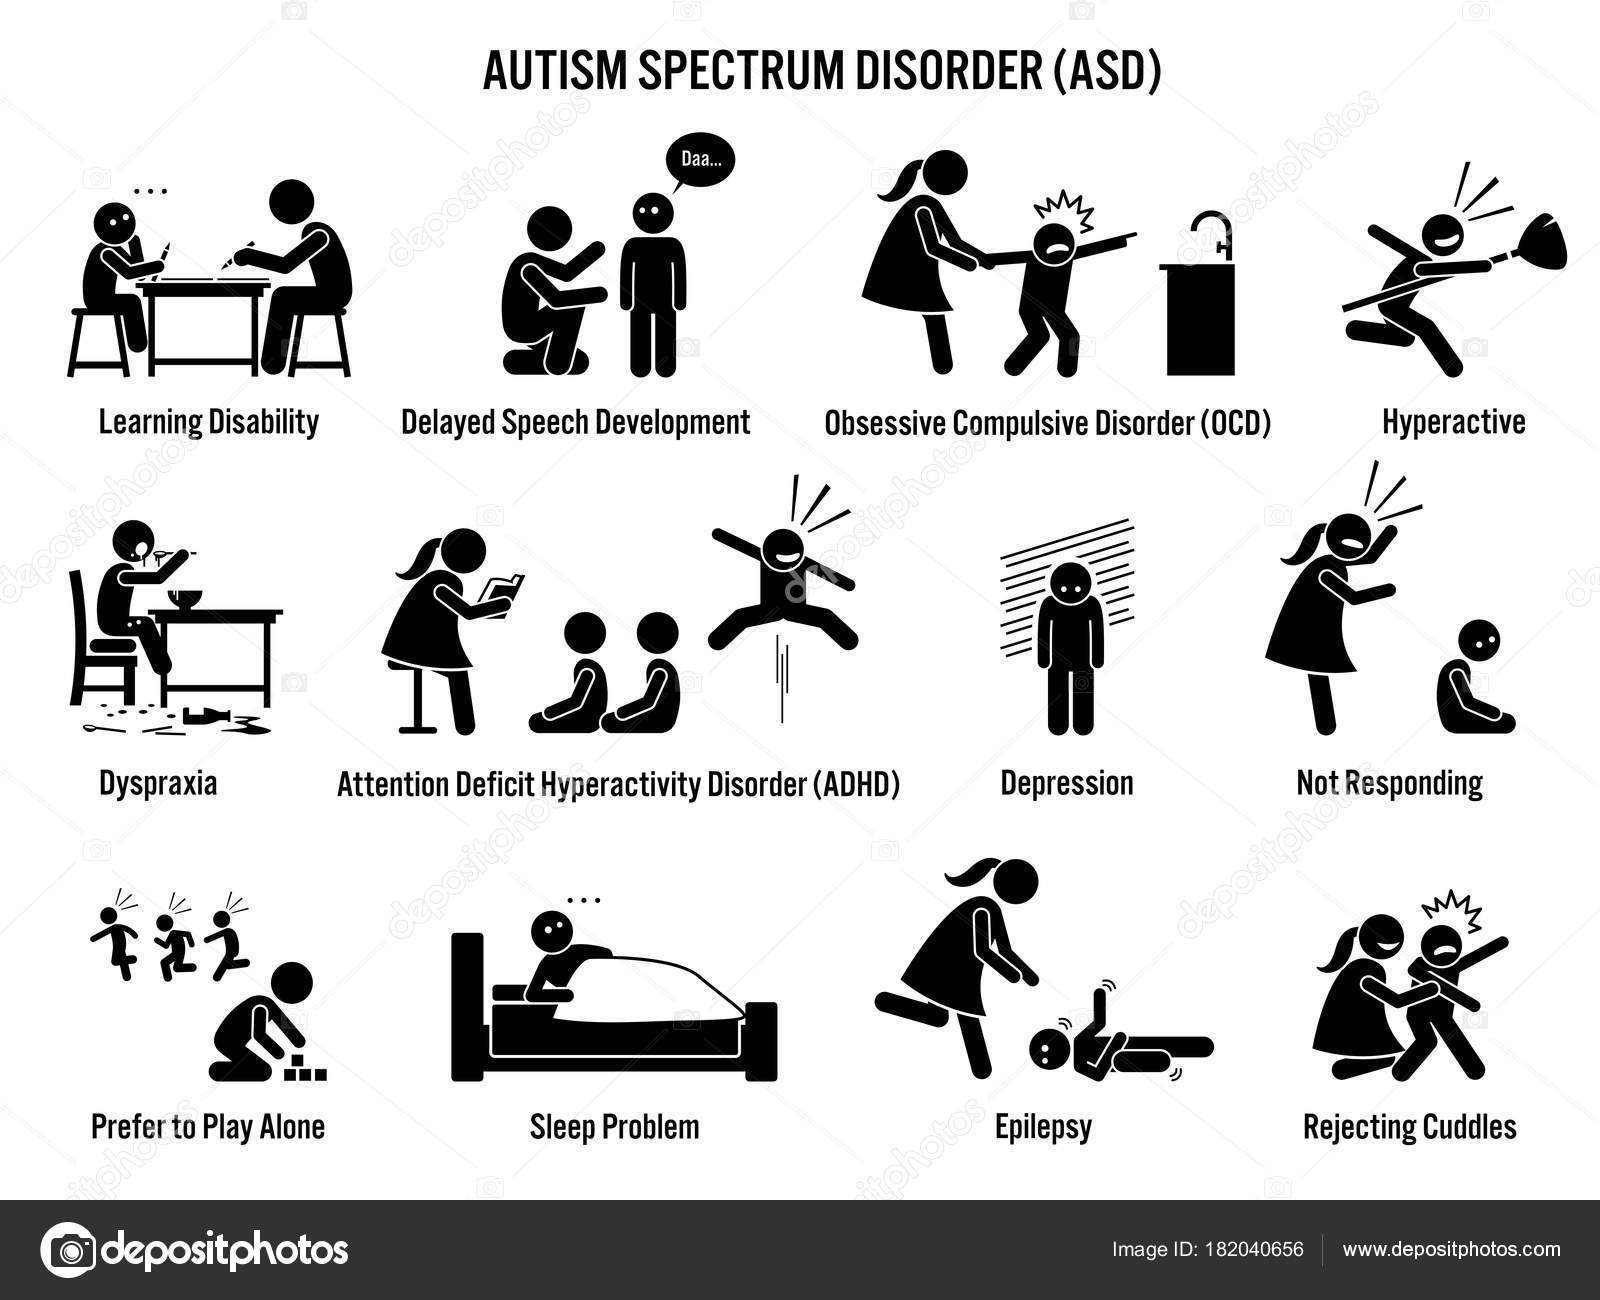 Extreem Kinderen Autisme Spectrum Stoornis Asd Pictogrammen Pictogrammen #EC16